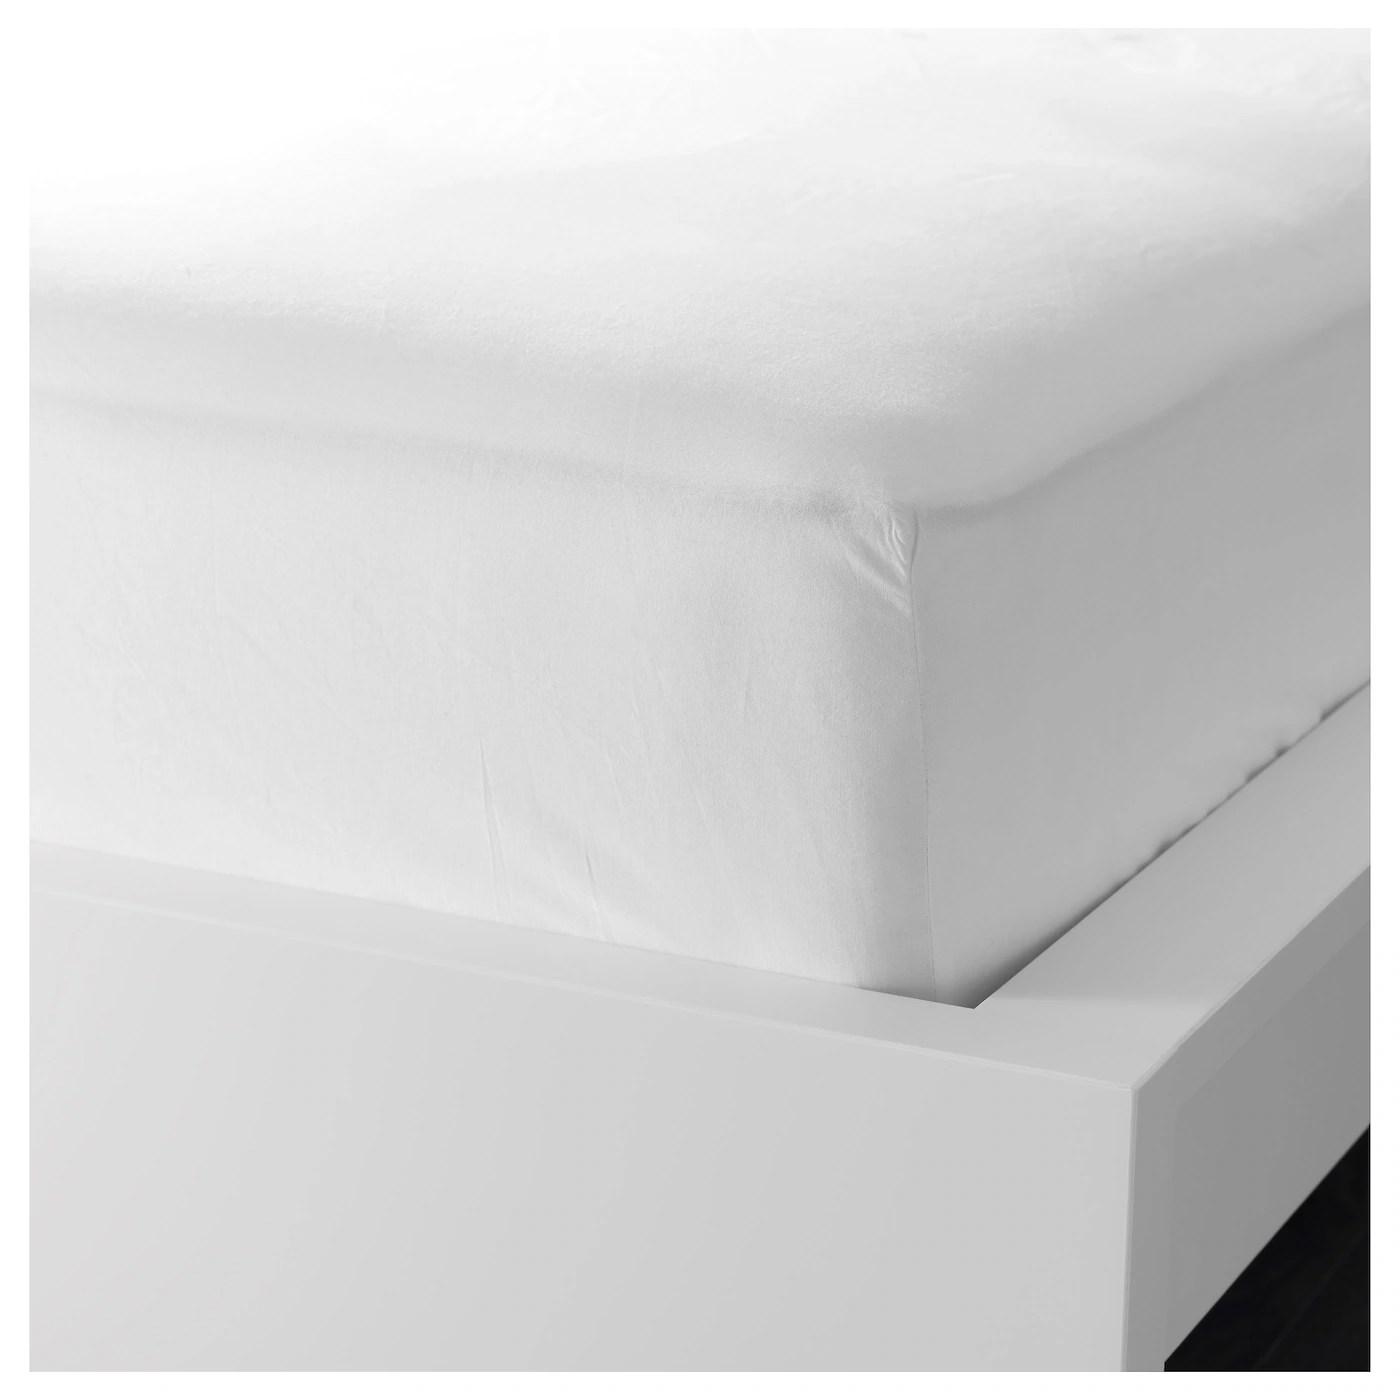 Fargmara Drap Housse Blanc 90x200 Cm Materiau Durable Ikea